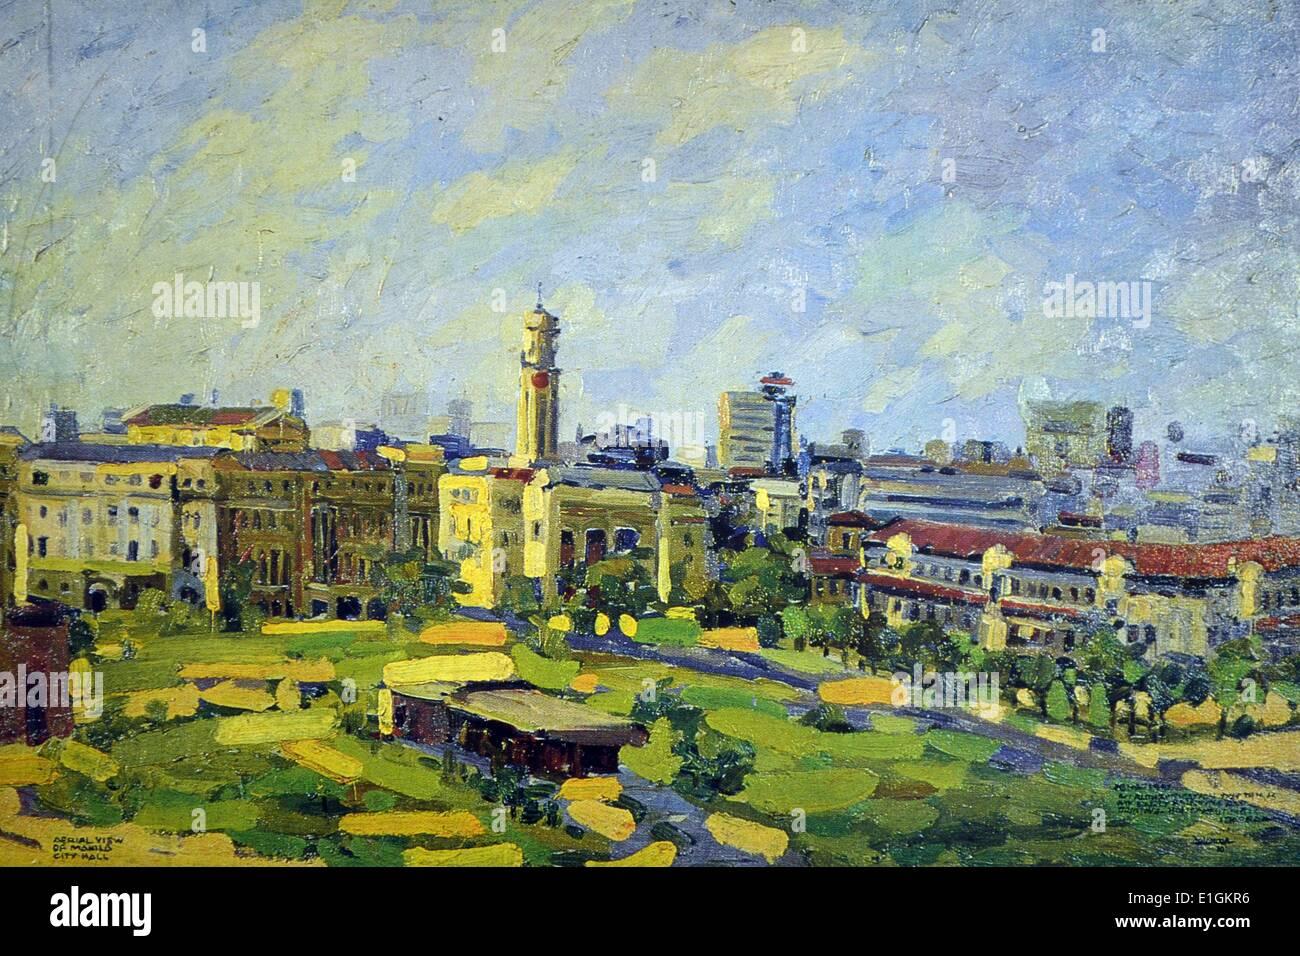 Ibarra De La Rosa, City hall, 1970. Oil on canvas. - Stock Image